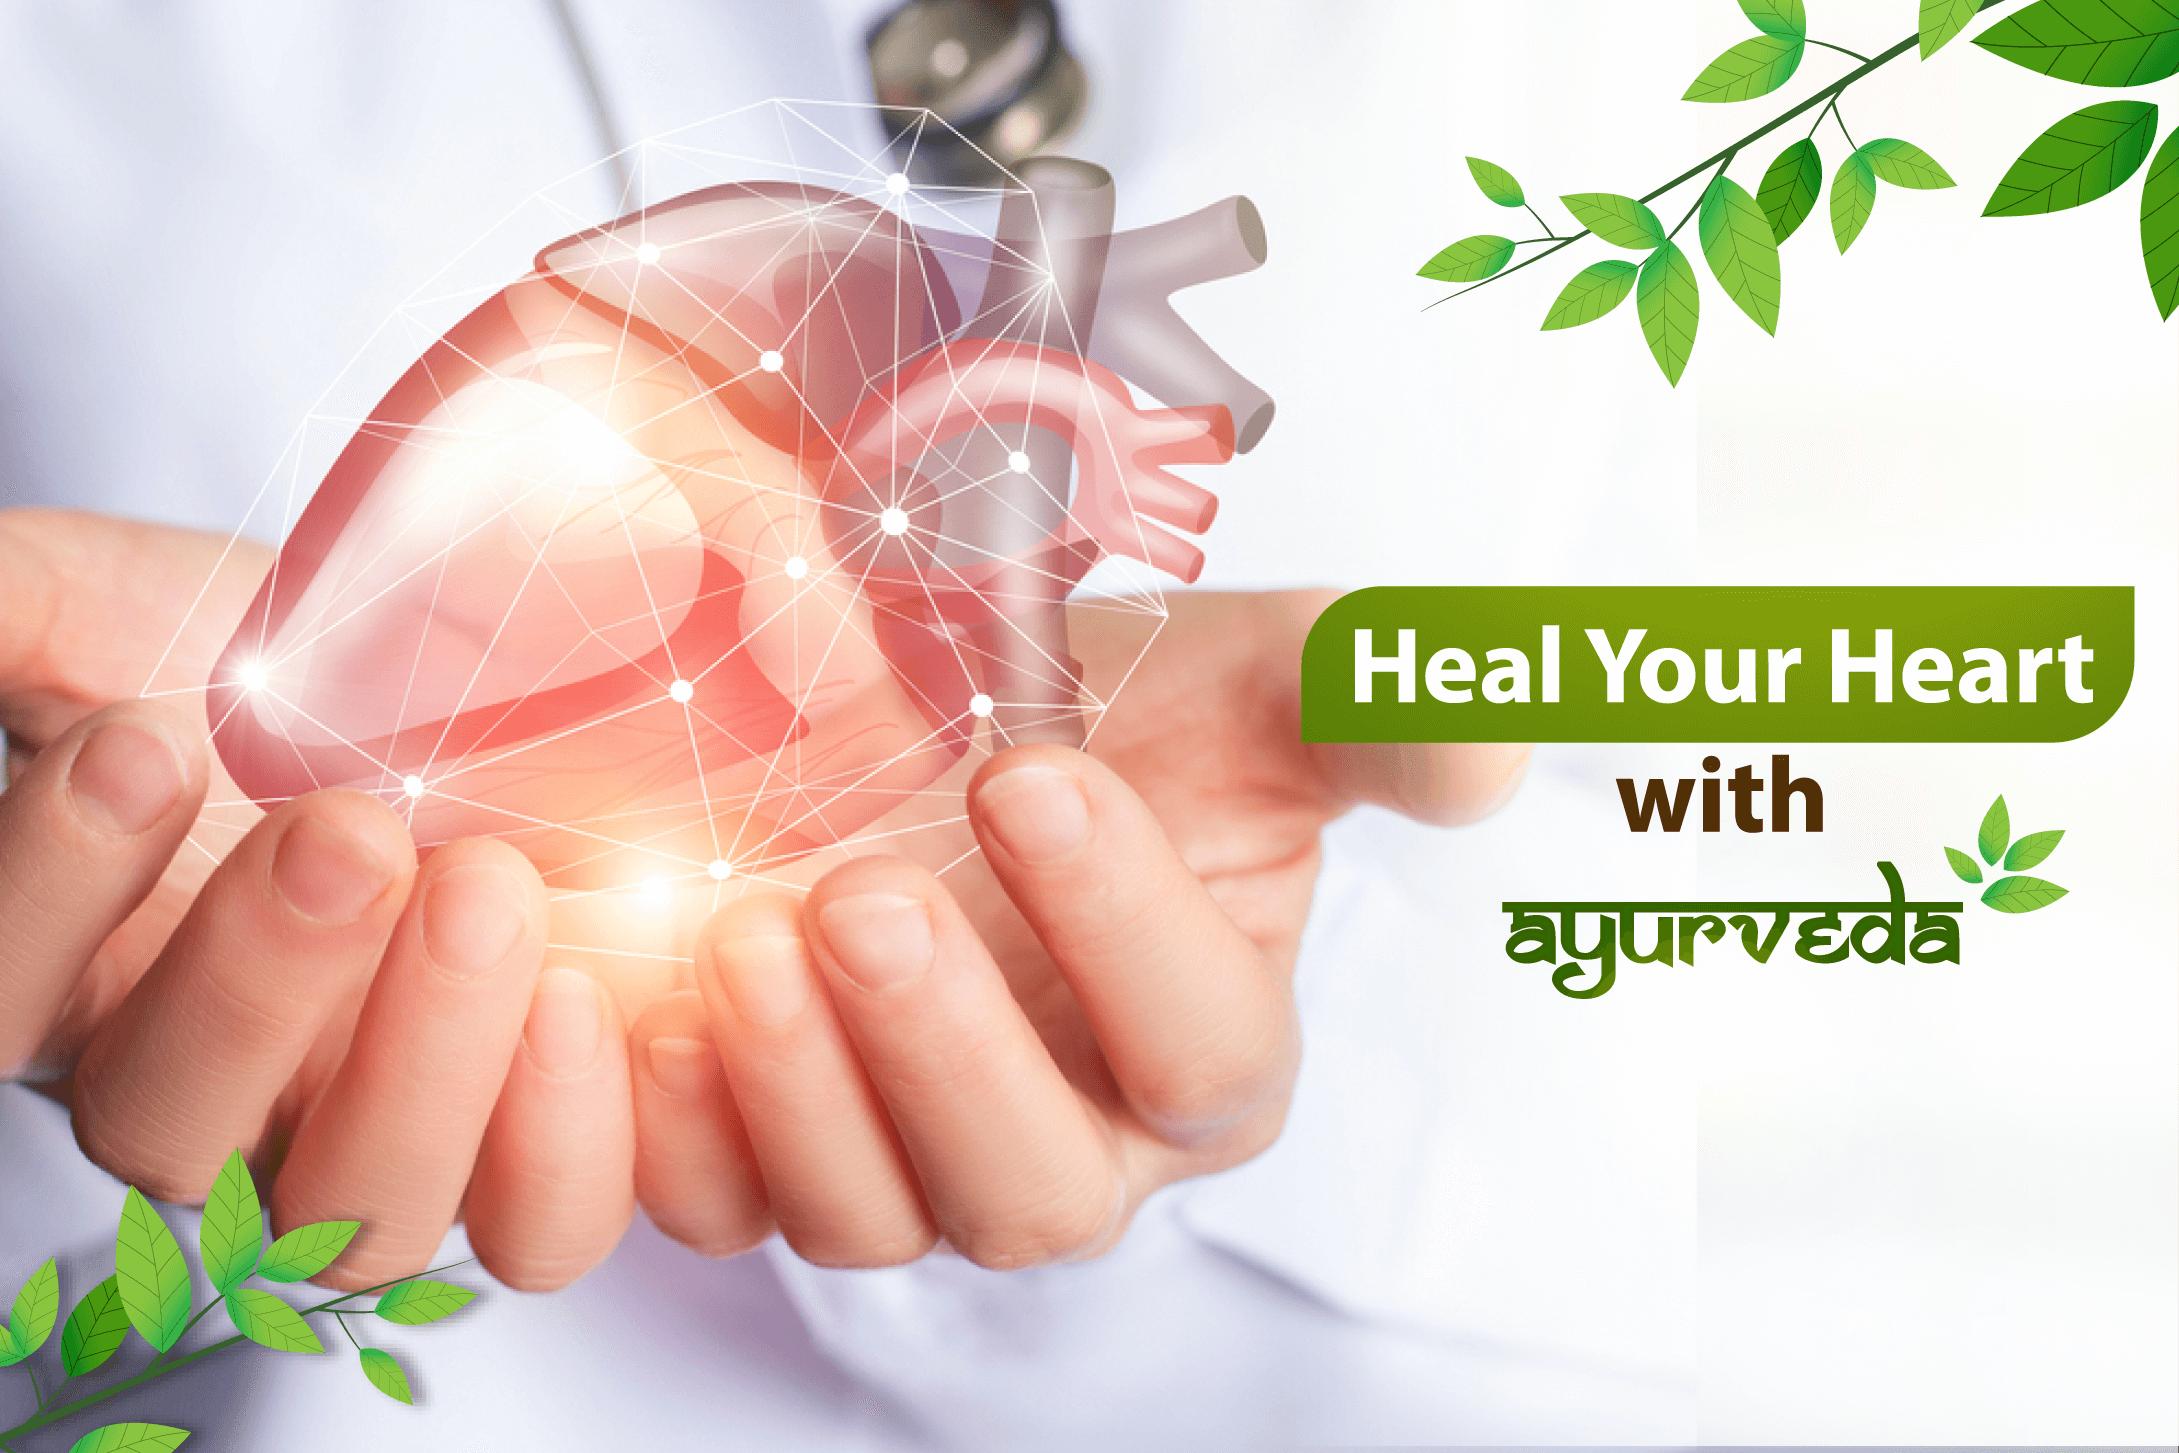 Ayurvedic Remedies that Help Treat Cardiovascular Diseases